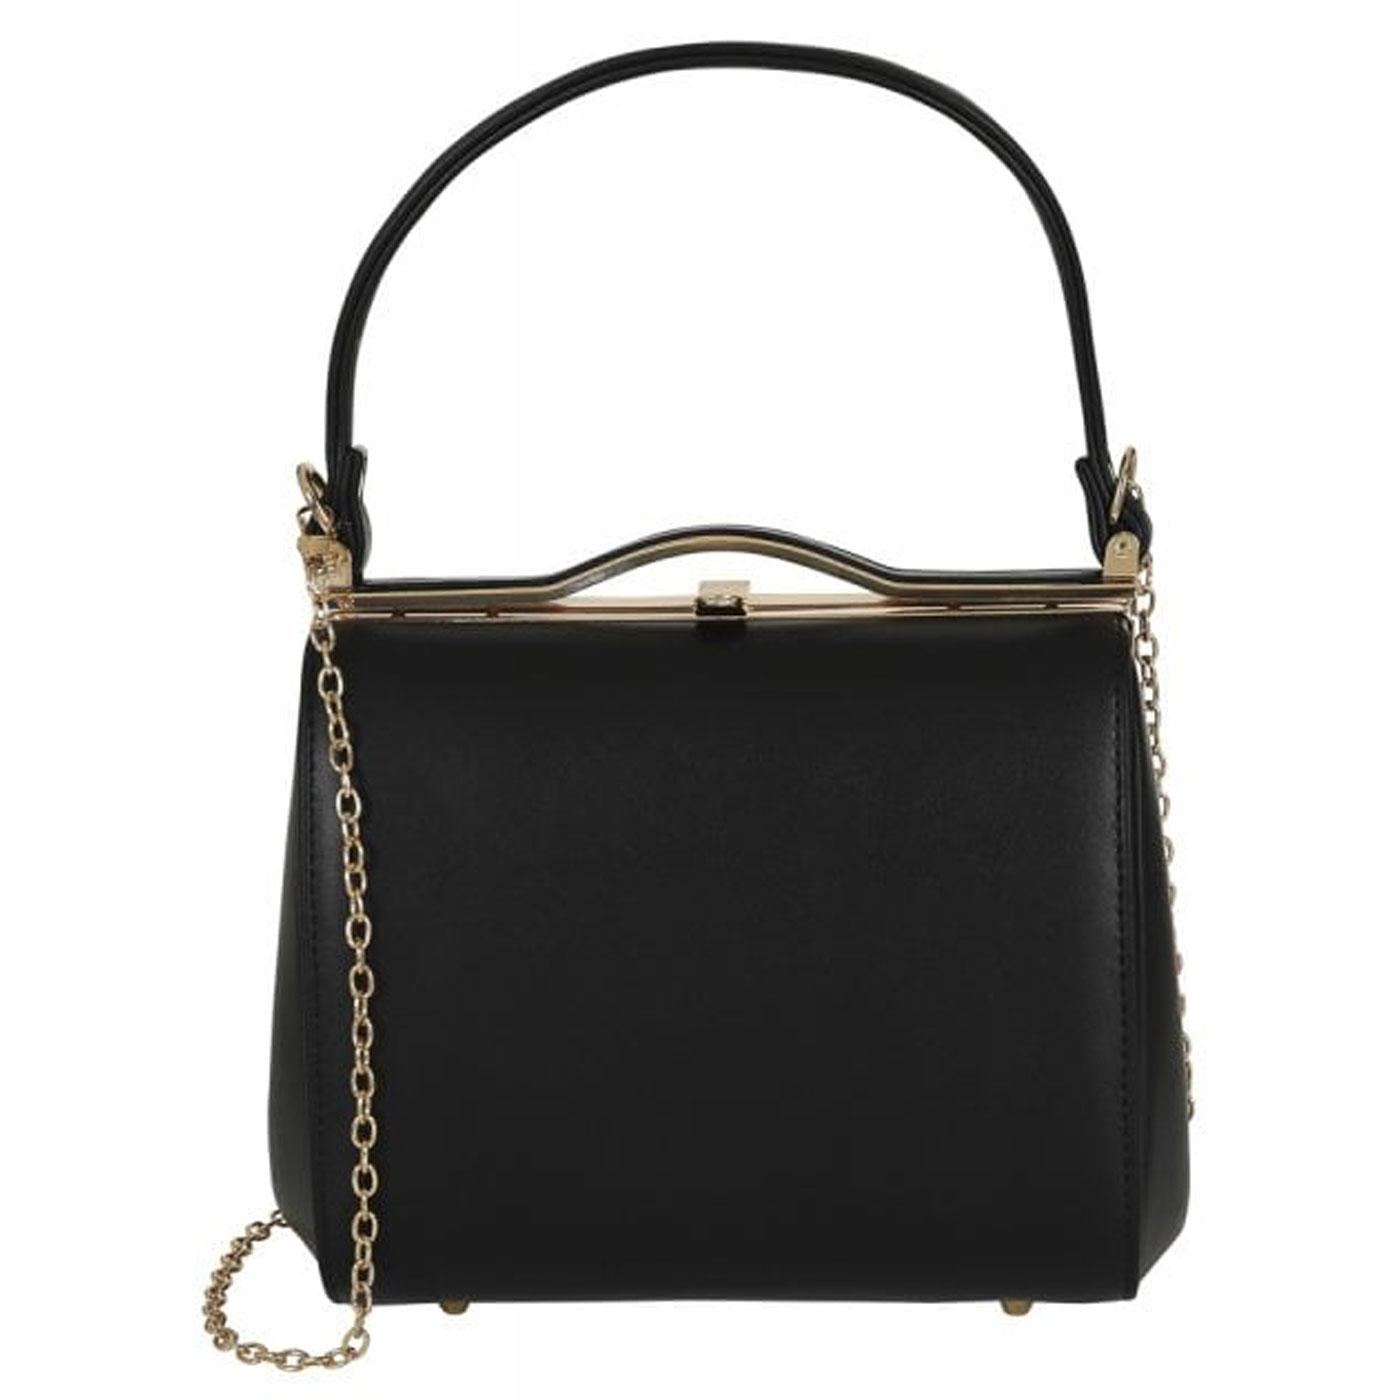 Carrie COLLECTIF Vintage Small Classic Handbag B